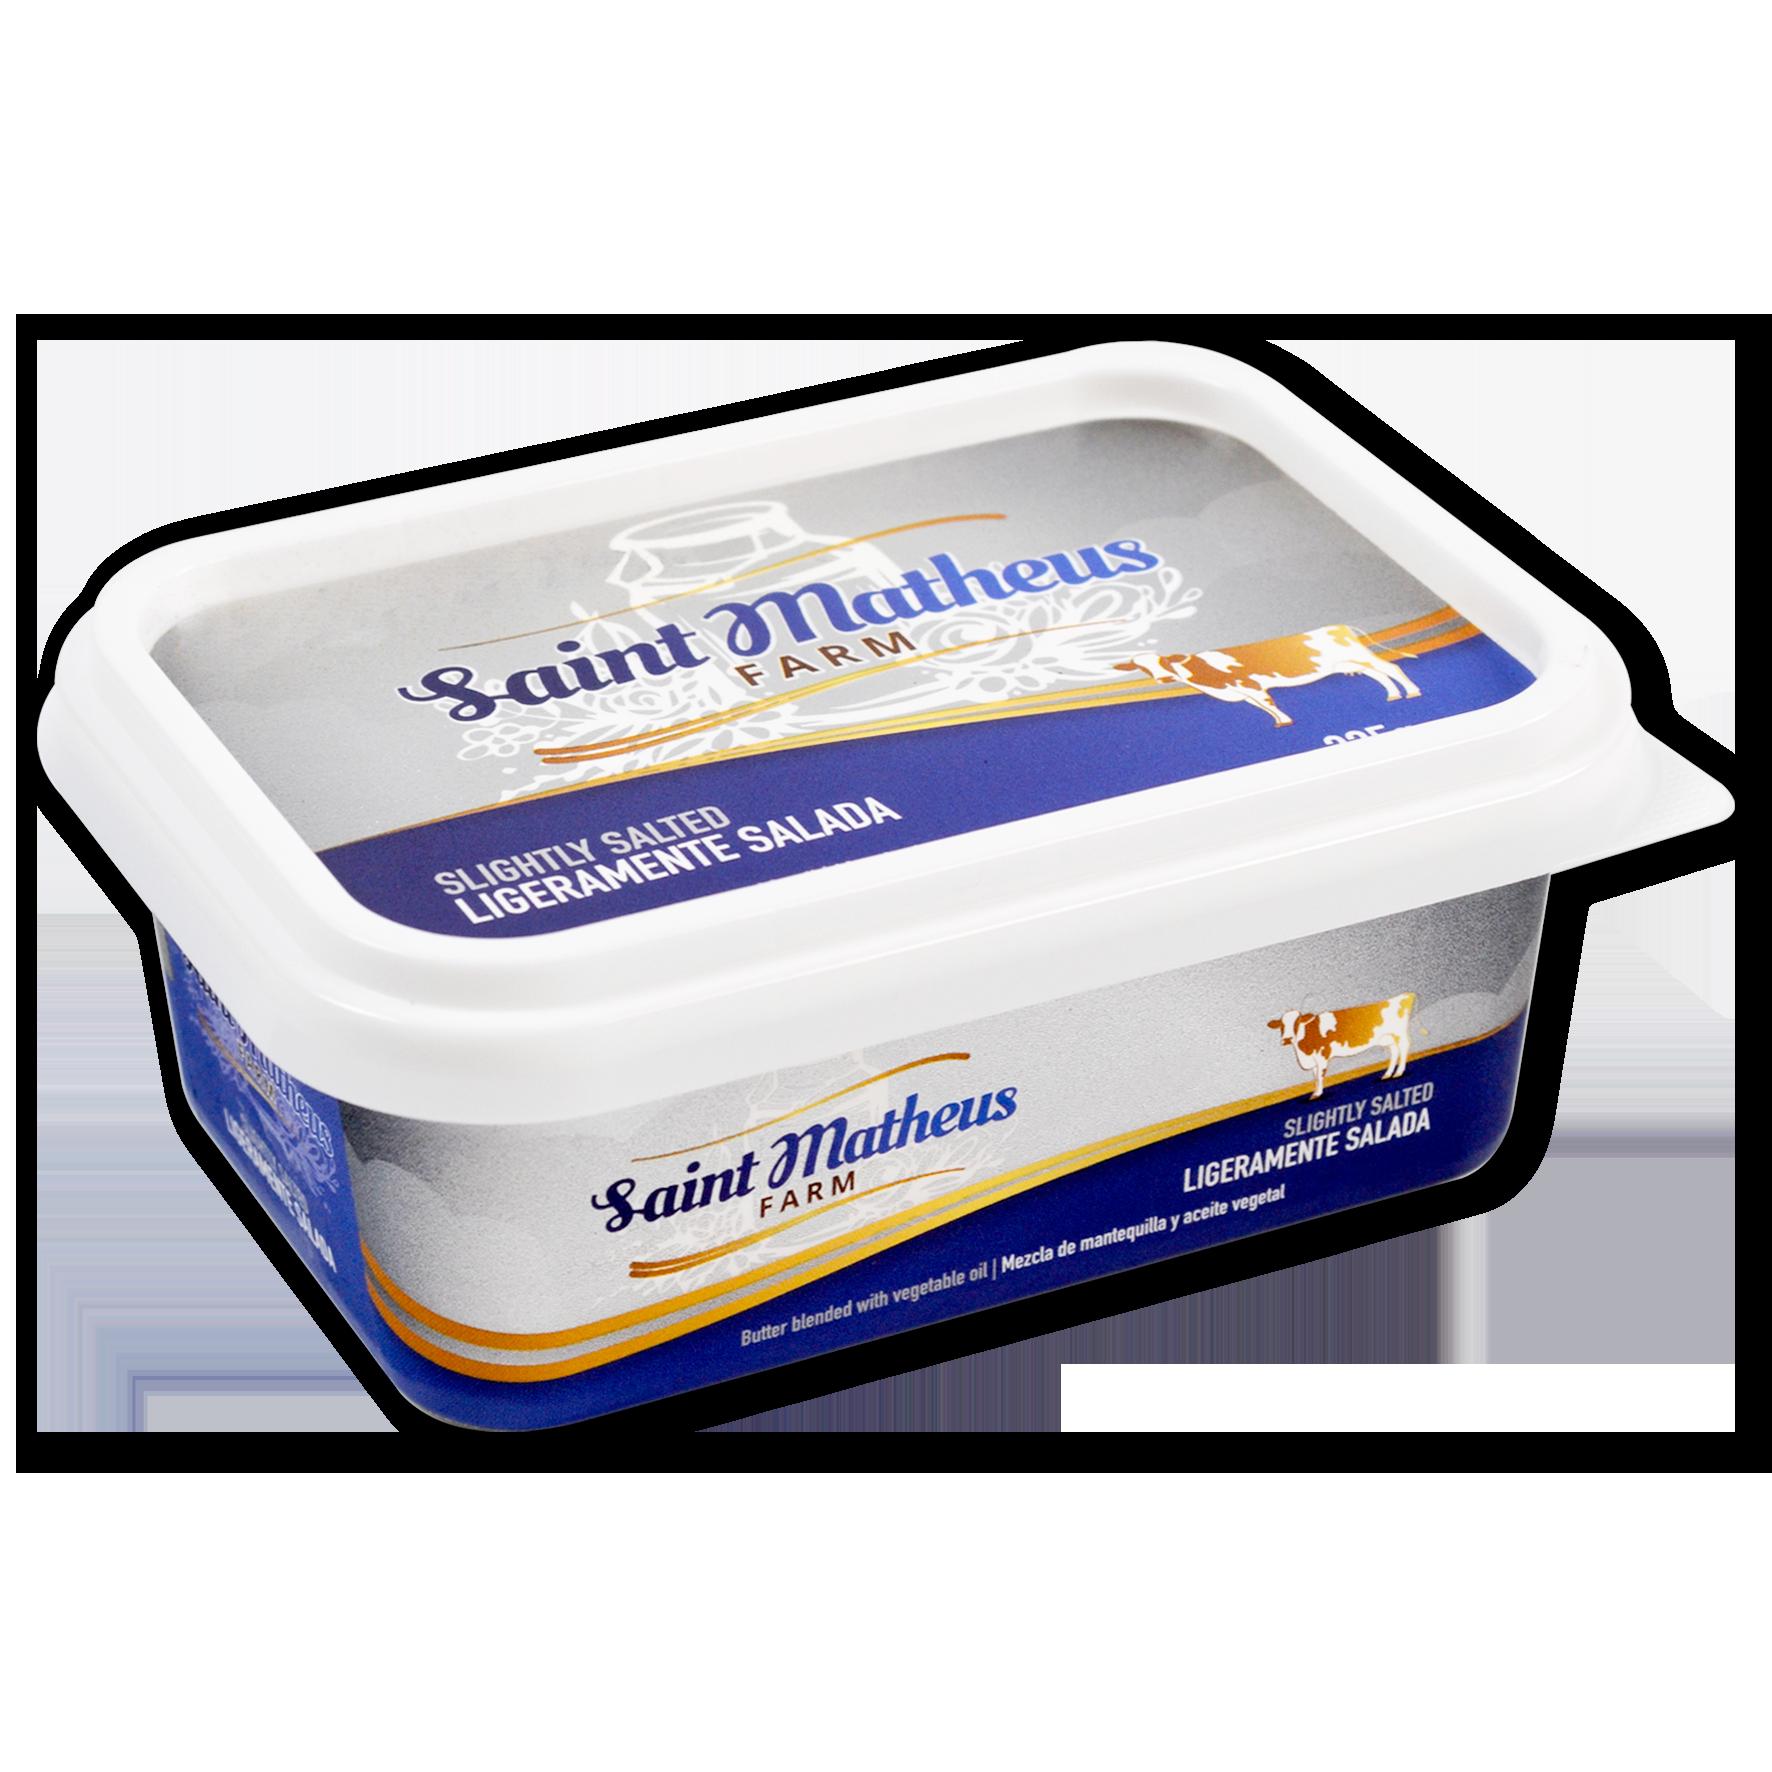 Mantequilla fácil de untar Saint Matheus